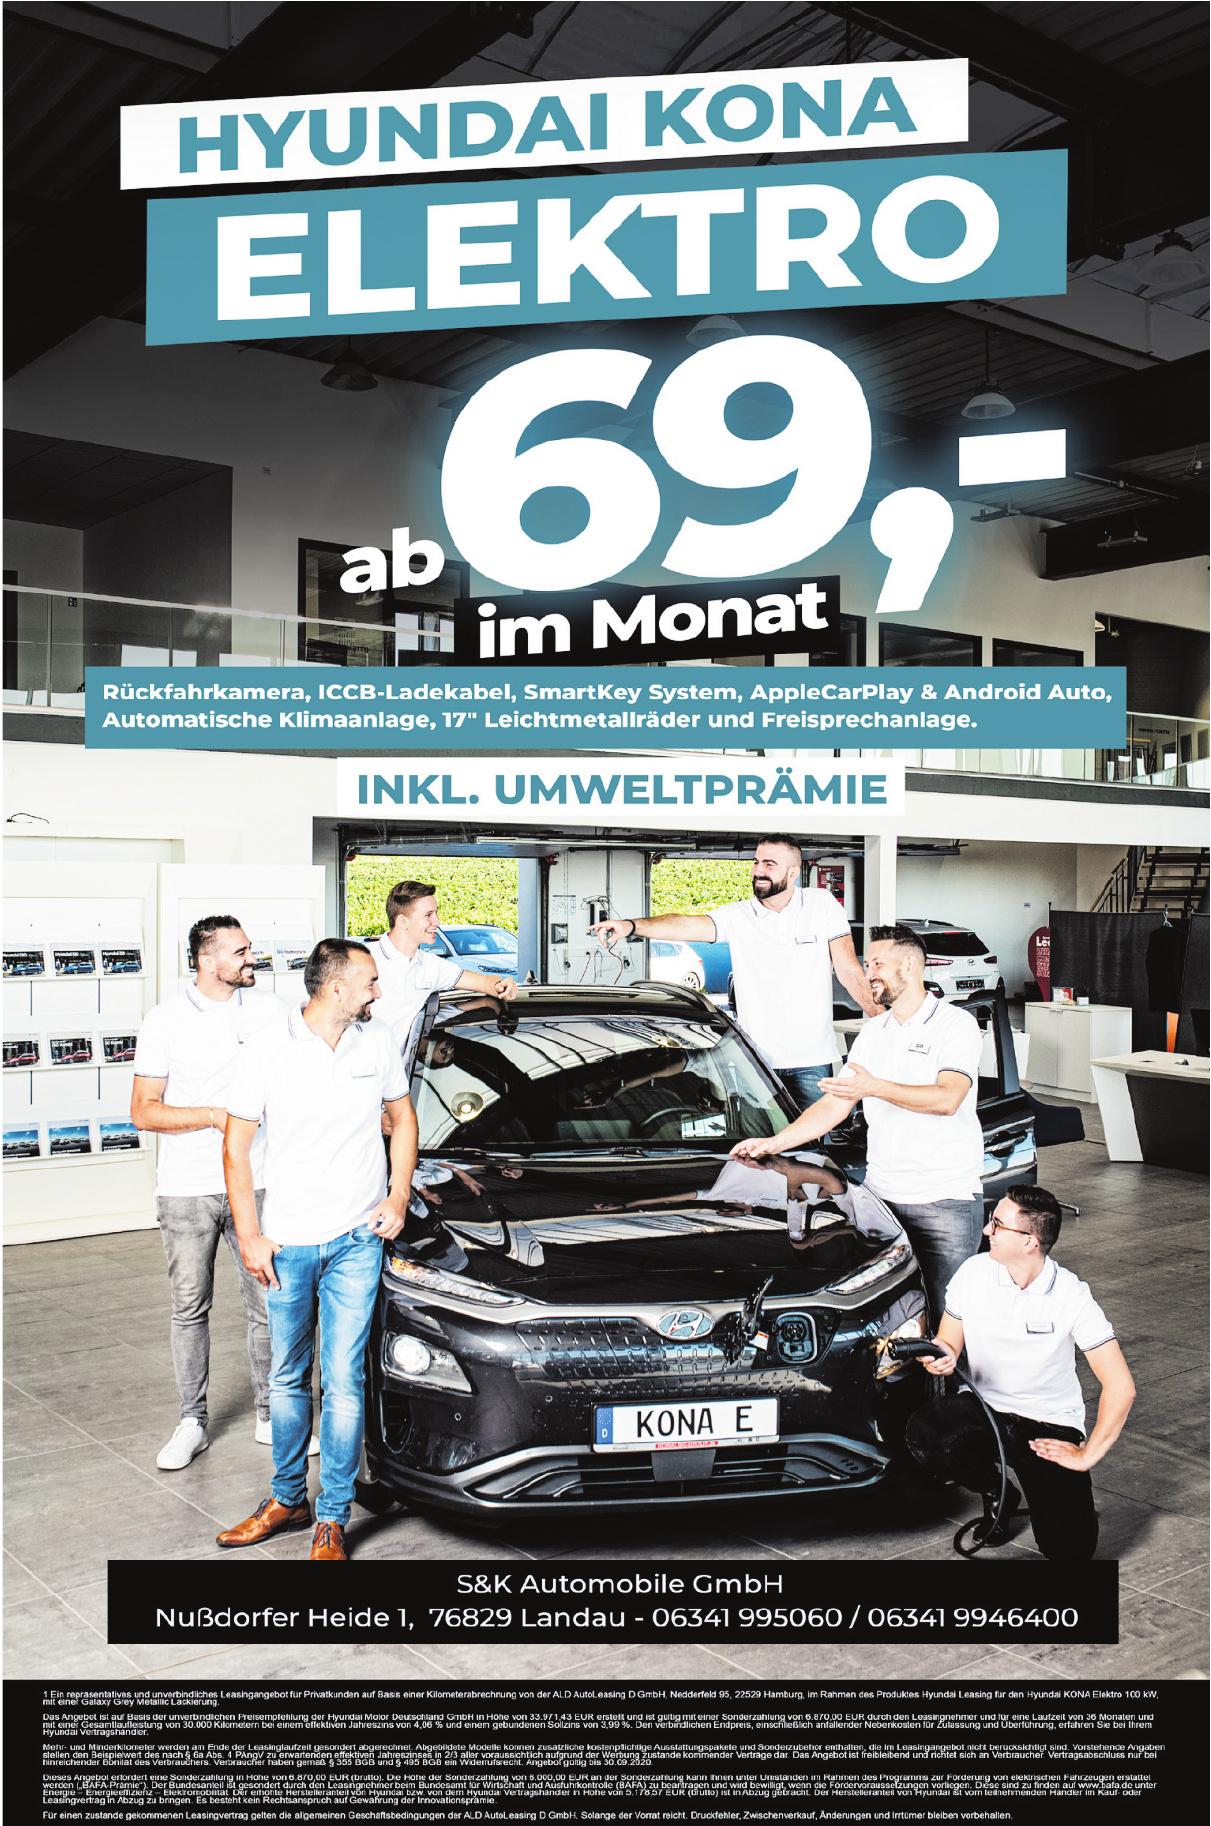 S&K Automobile GmbH